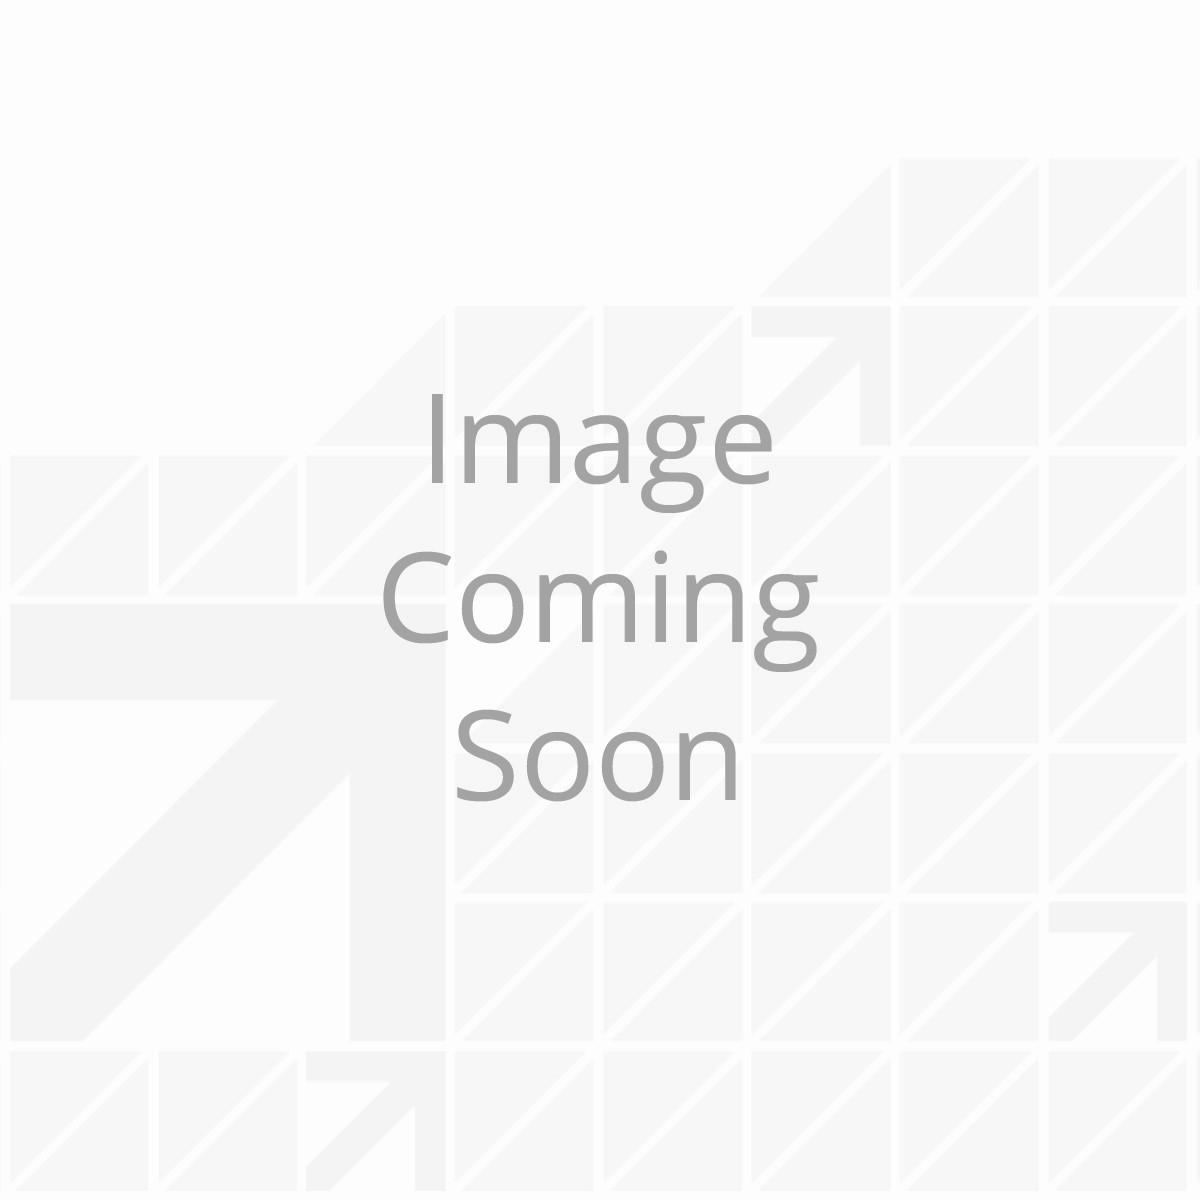 HDMI10FV4_1.png